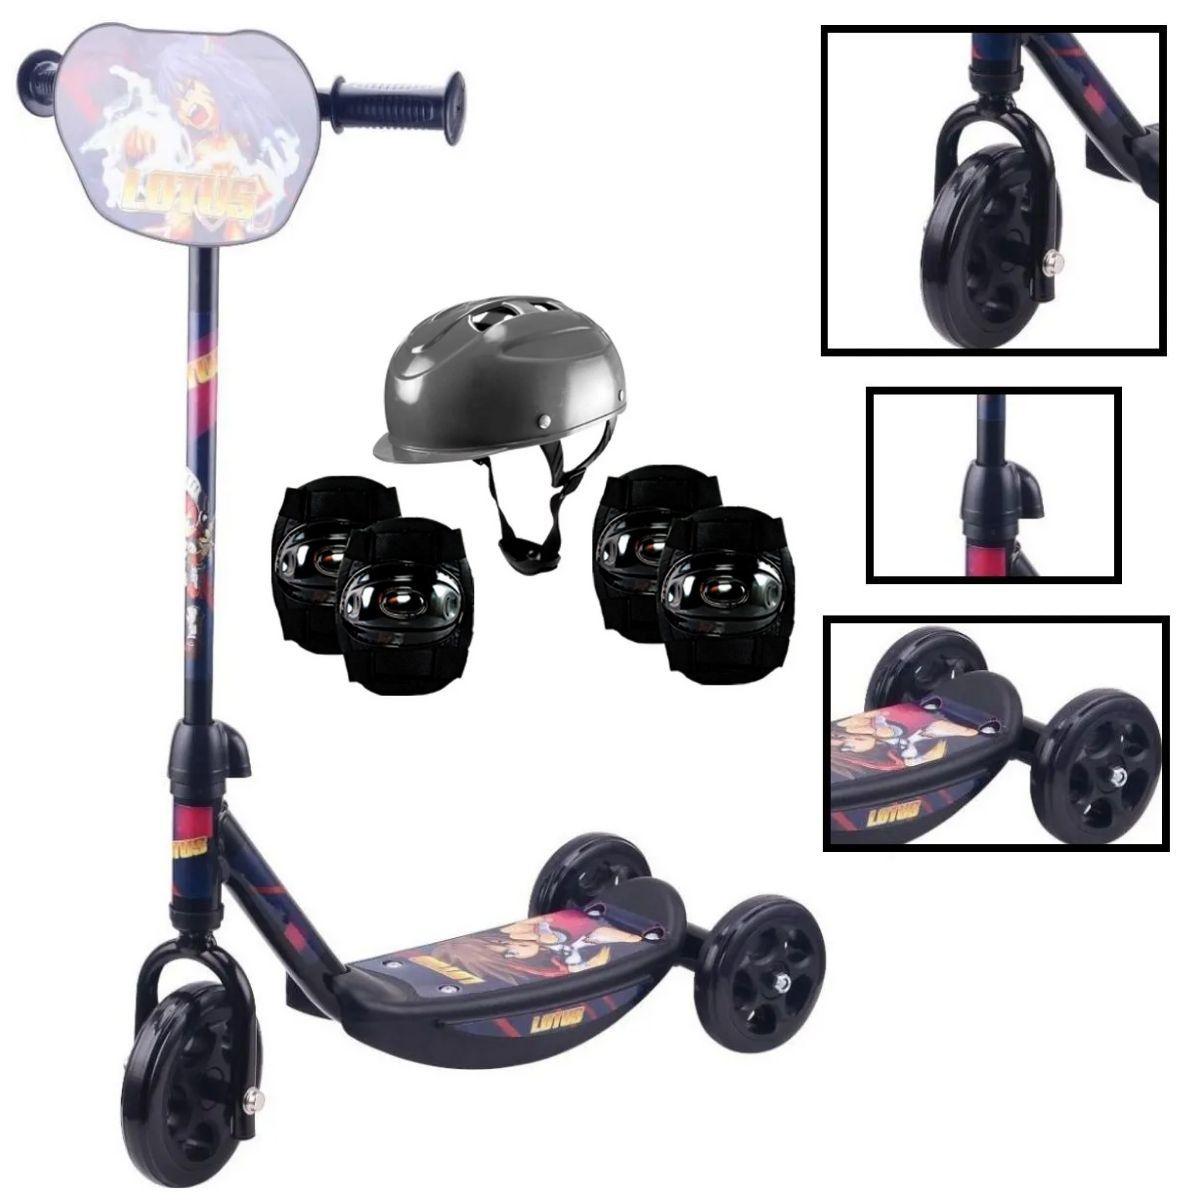 Patinete Infantil Para Meninos Preto 3 Rodas Com Kit Proteção Preto - YTT-07PR-LX